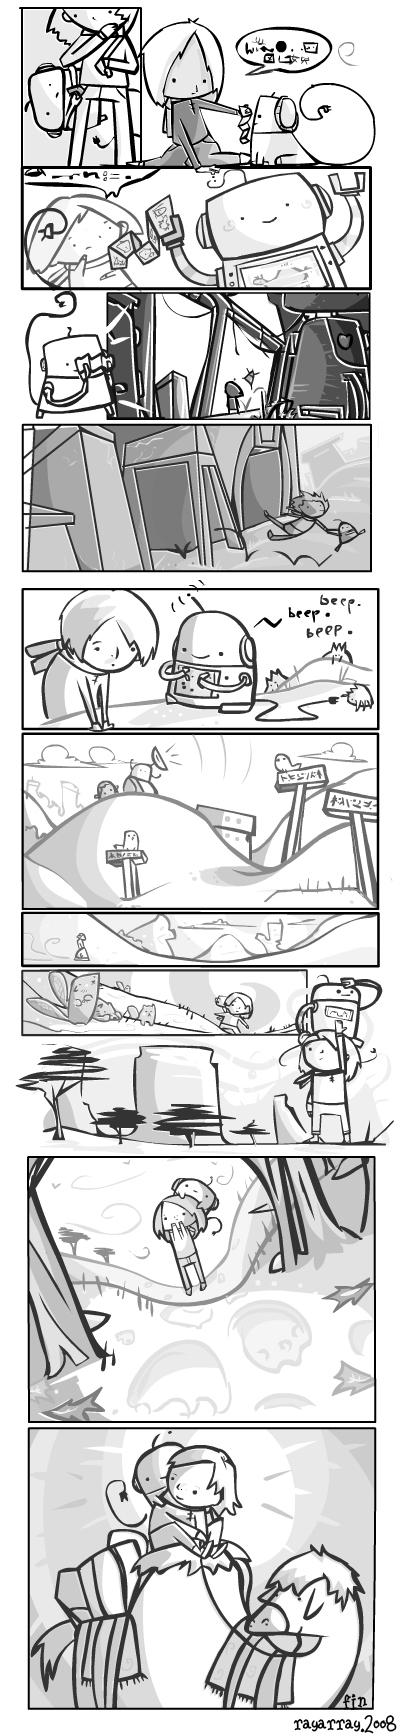 we are friend : mini comic 4 by RayArray